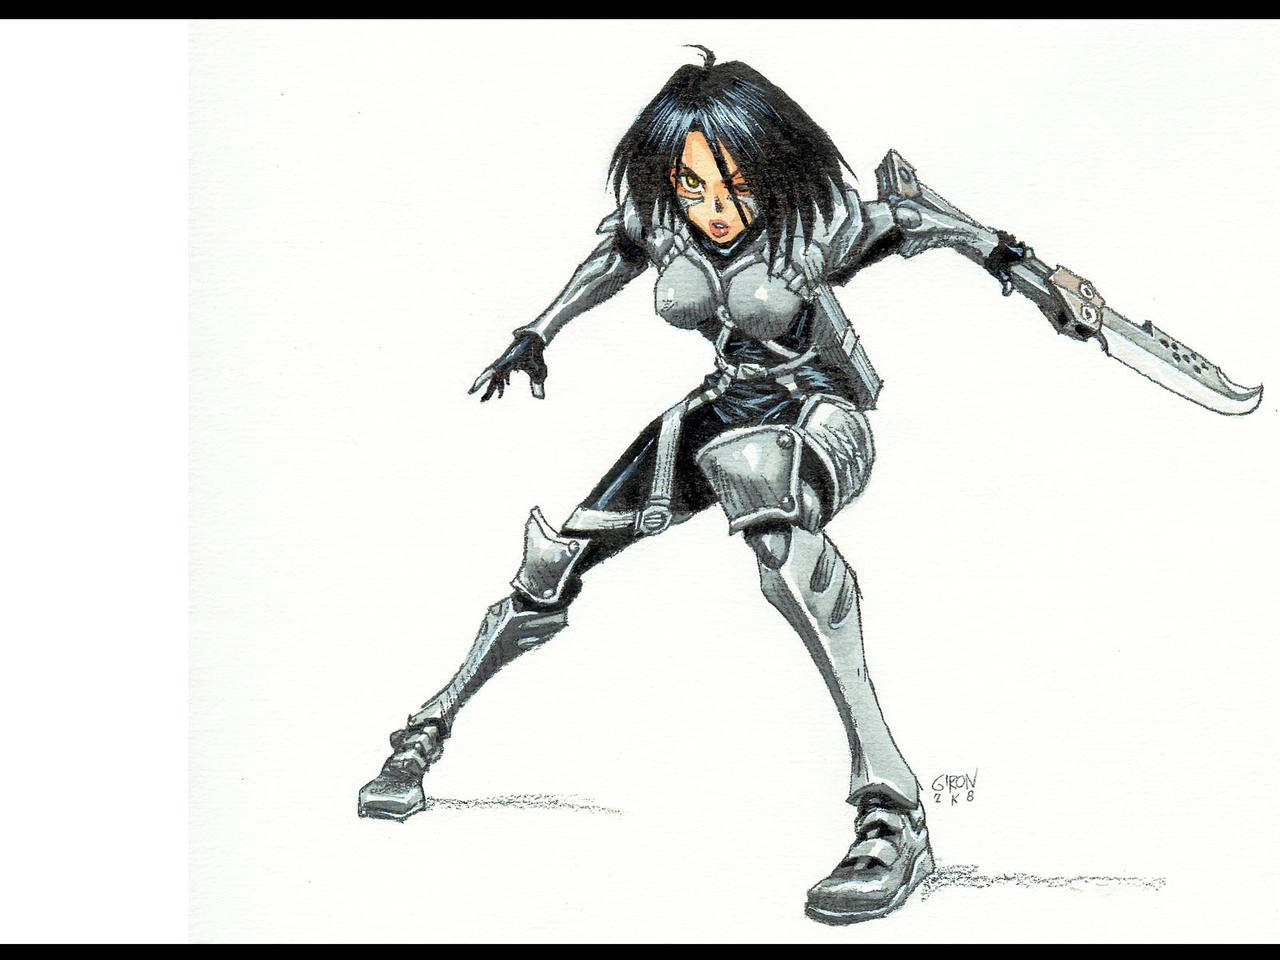 Alita Battle Angel >> ALITA's_Damascus_blade by s2ka on DeviantArt